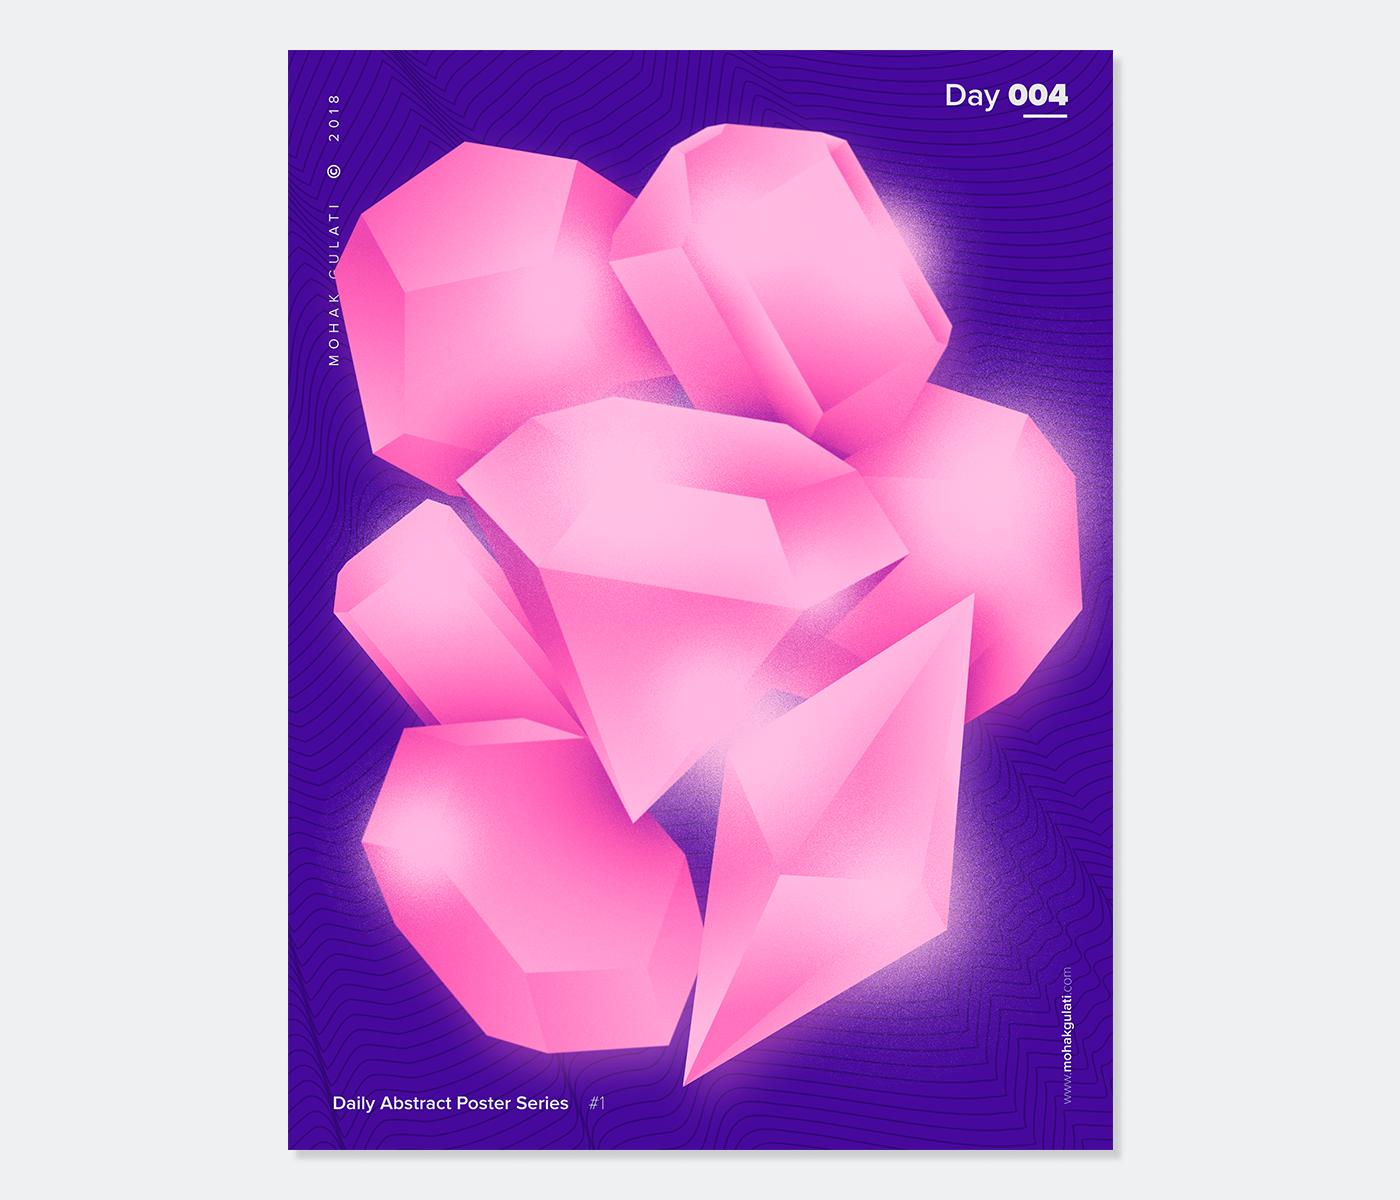 abstract poster Baugasm vasjen katro Weekly series adobeawards